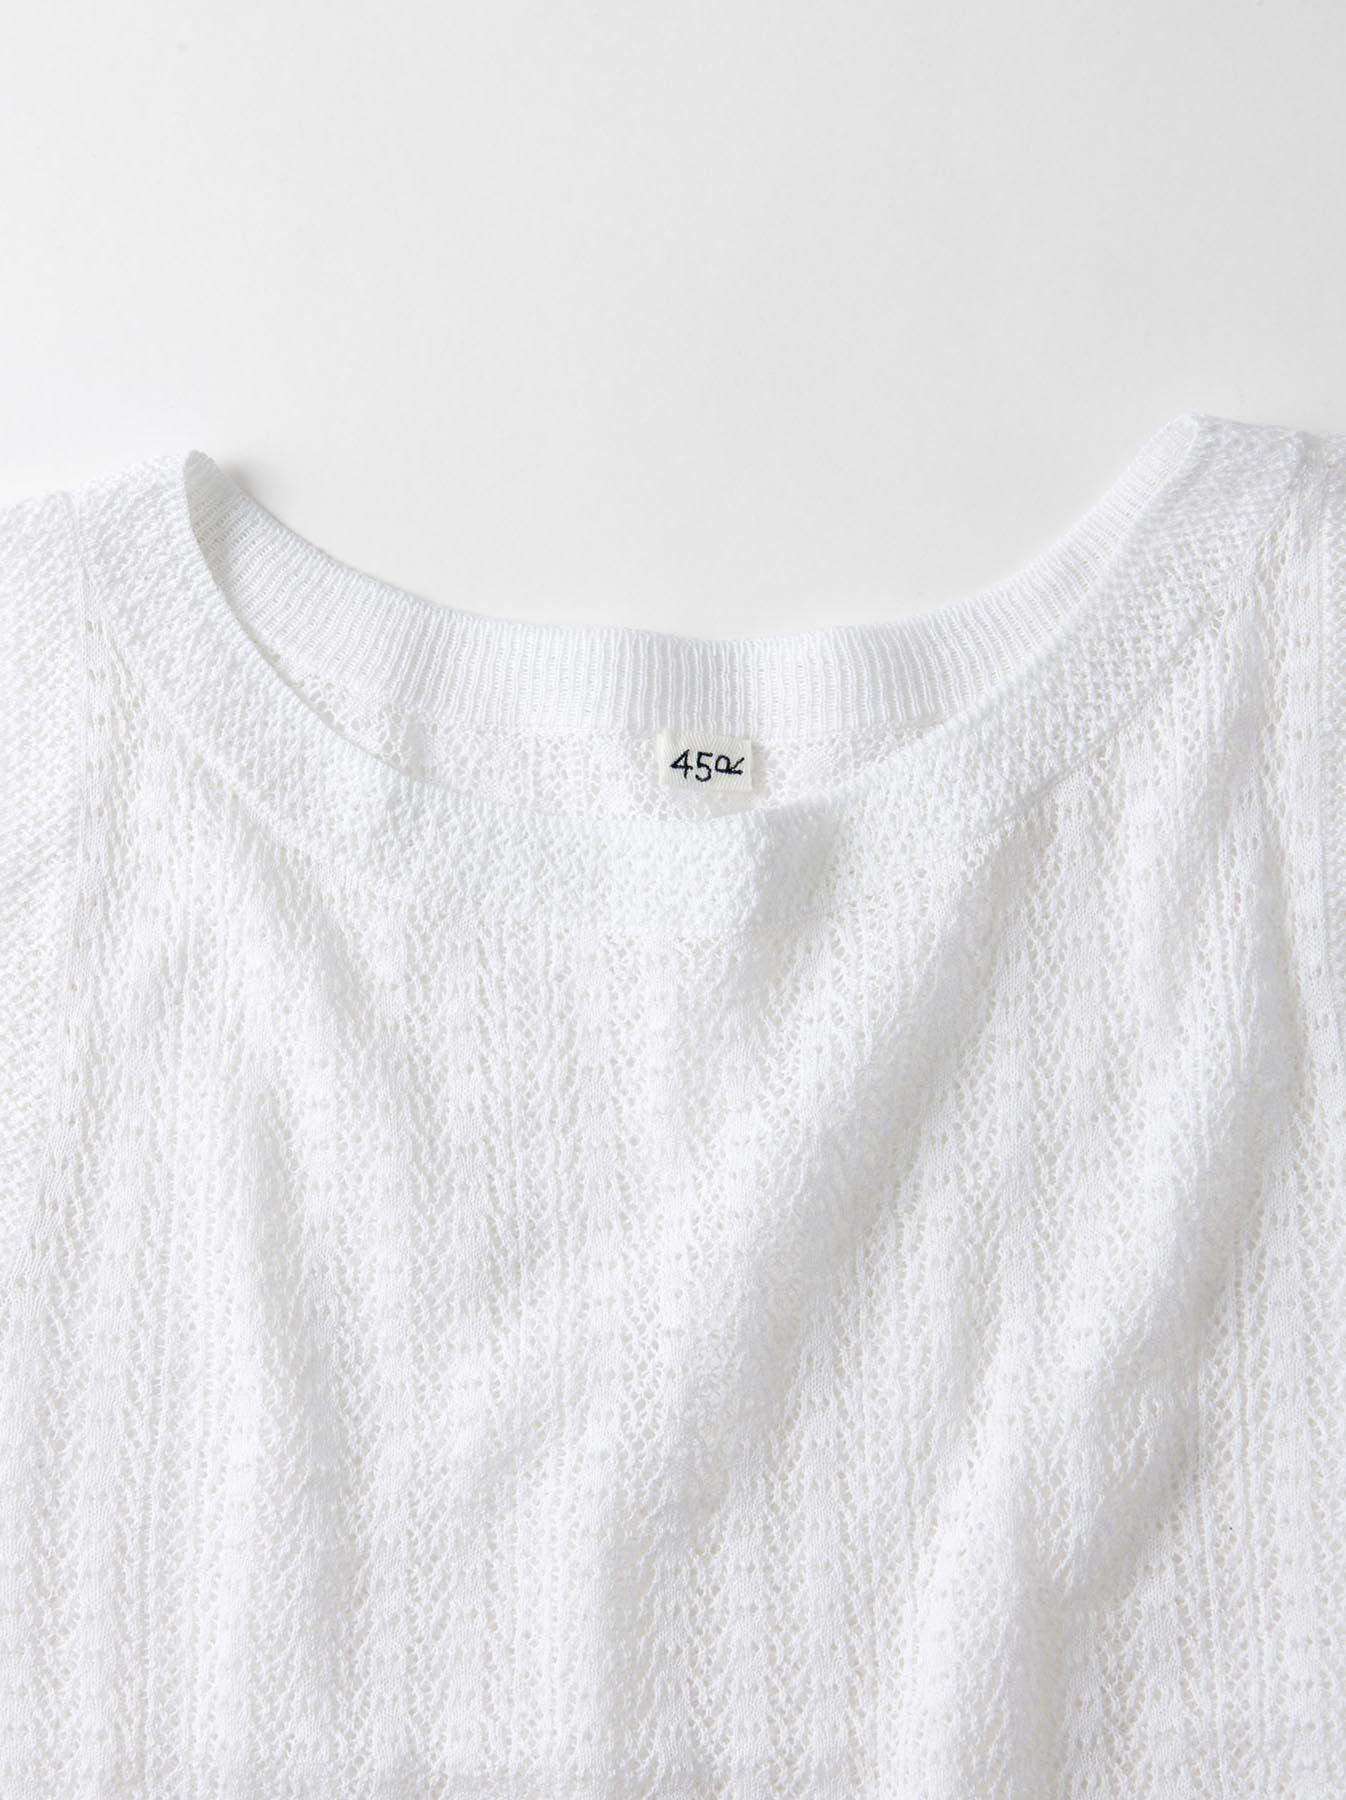 WH Gima Knit Lace Sleeveless Top-6